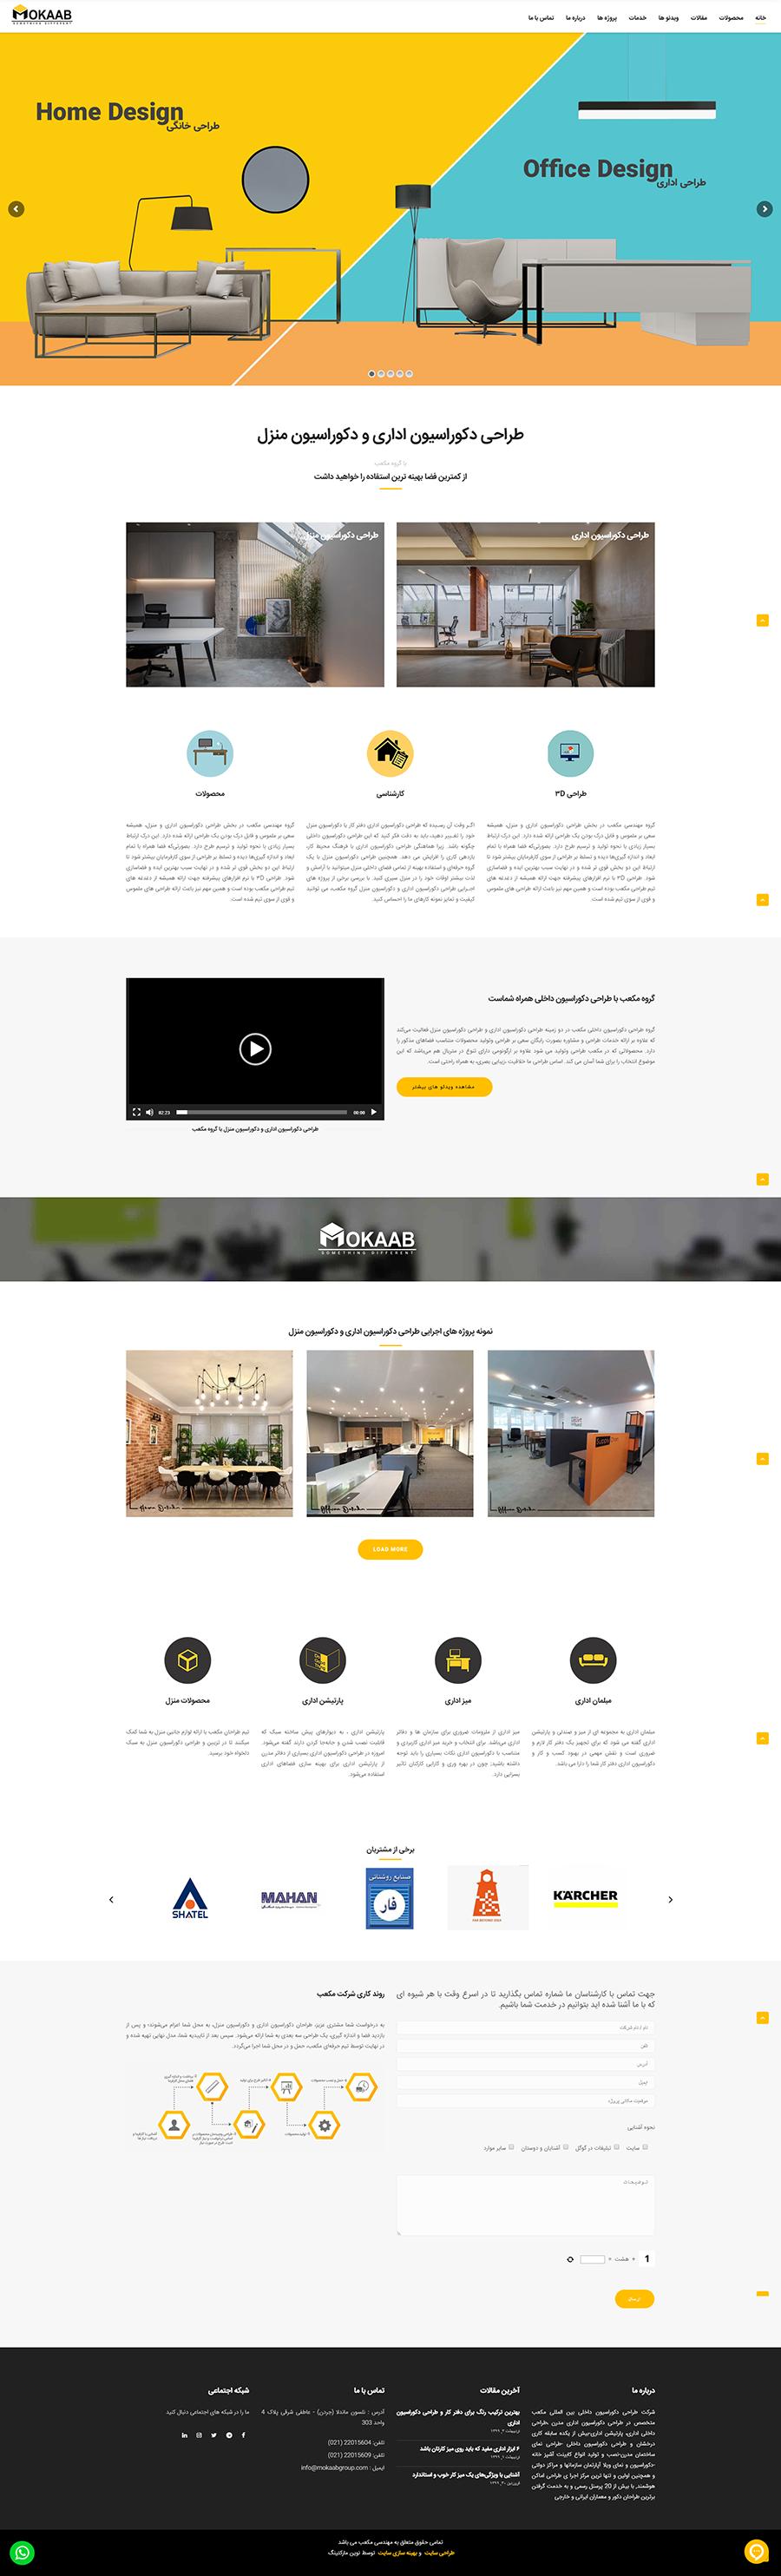 طراحی دکوراسیون داخلی مکعب